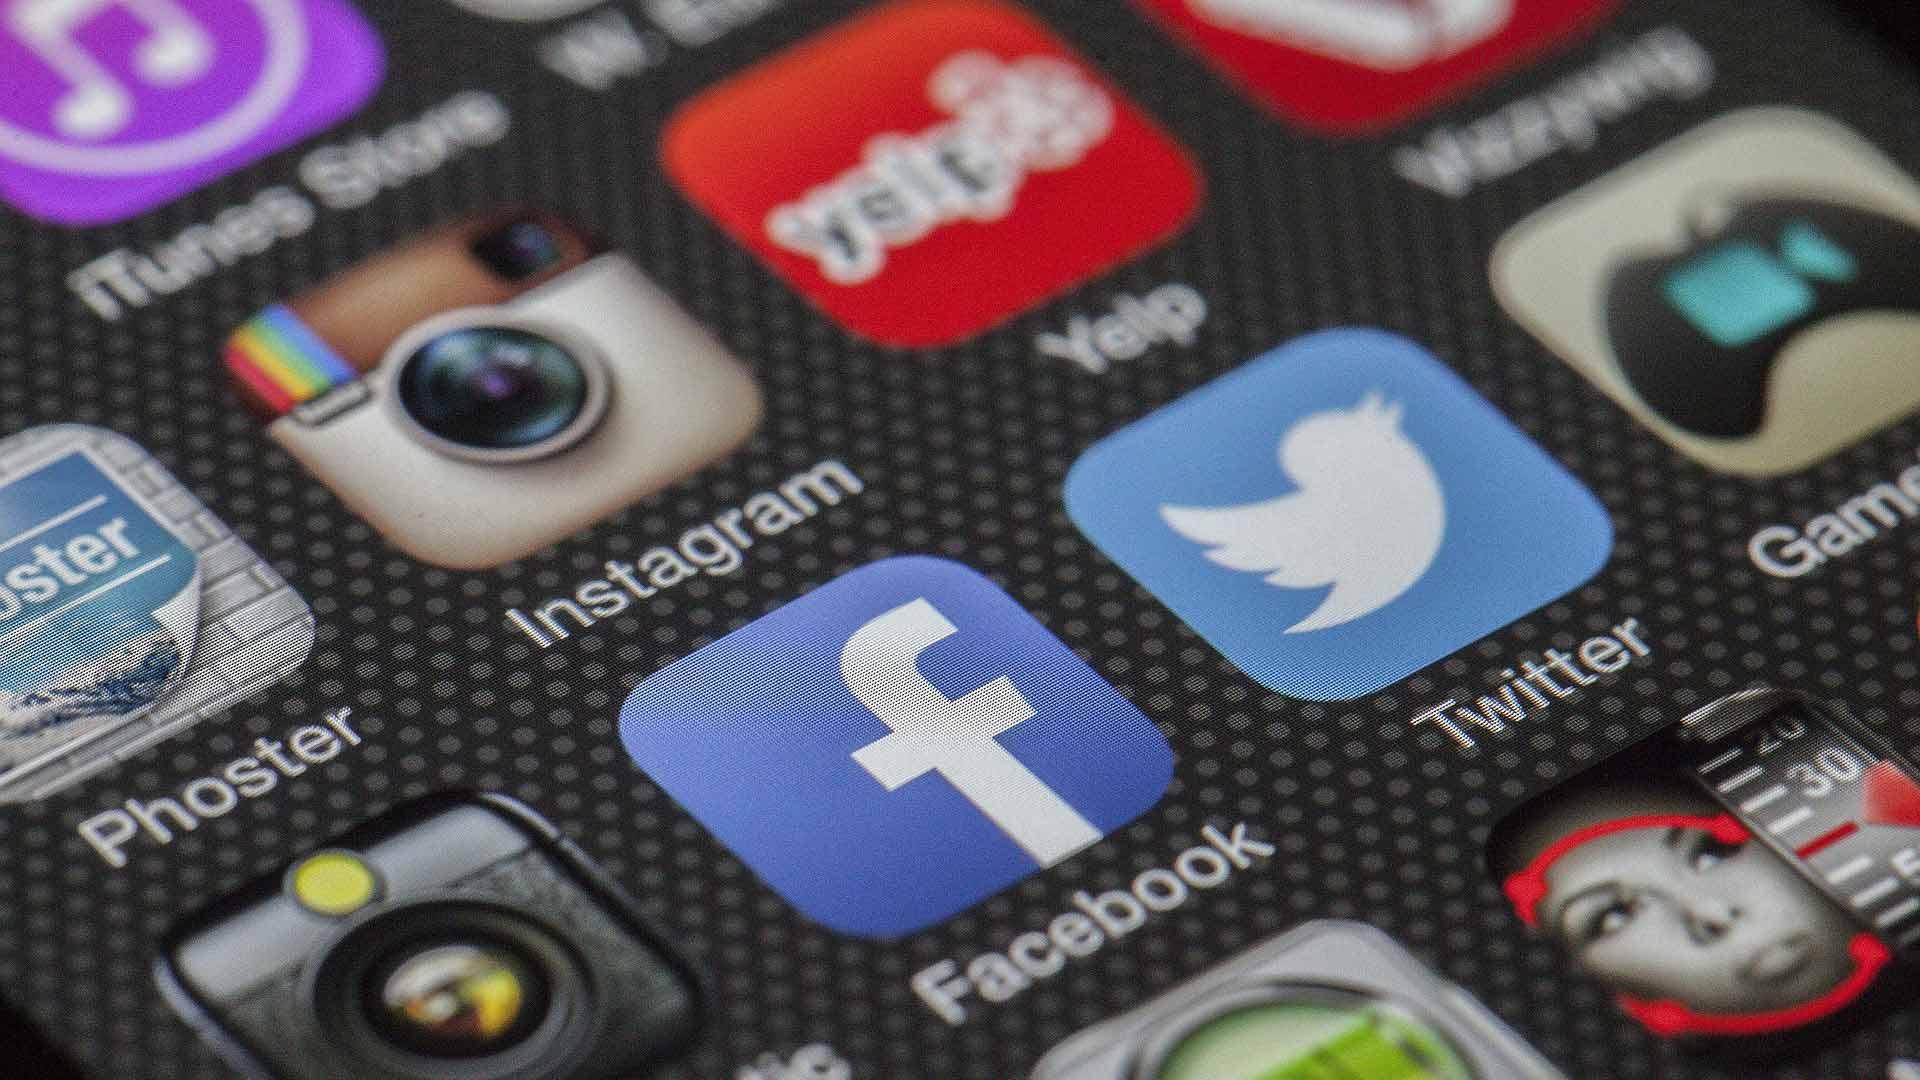 I vantaggi della Sentiment Analysis sui social network